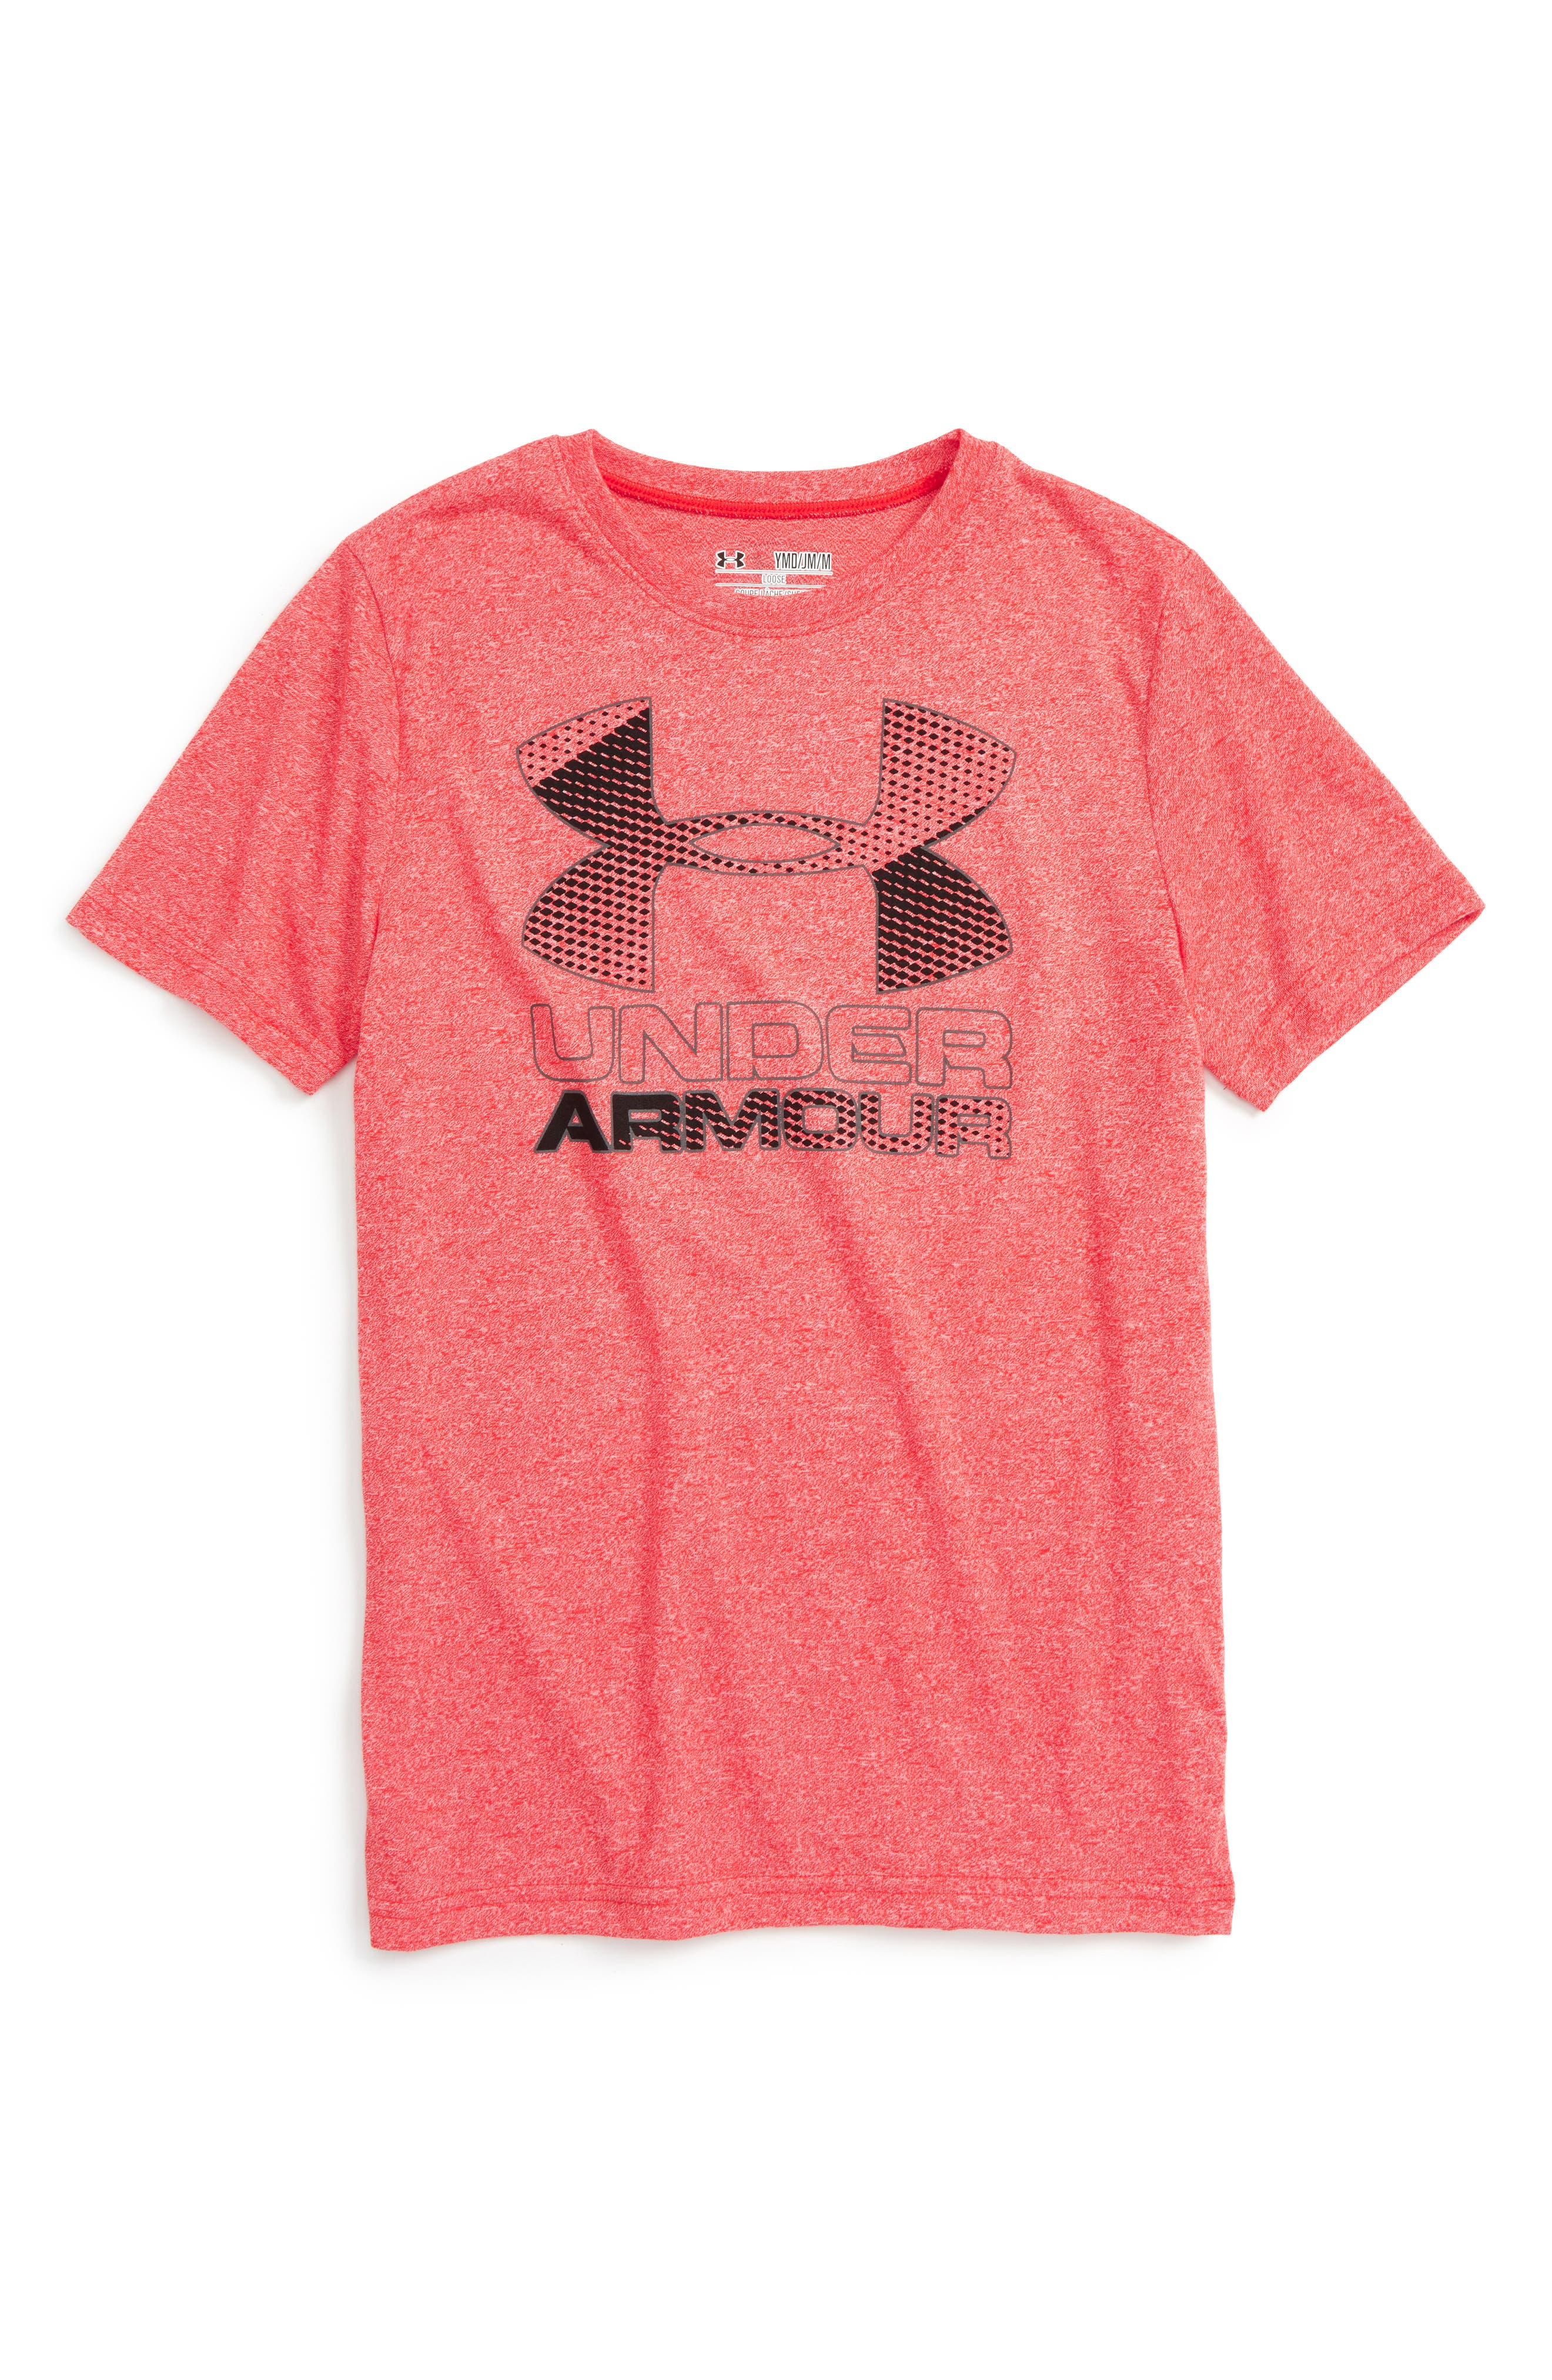 Main Image - Under Armour Big Logo Hybrid 2.0 HeatGear® T-Shirt (Little Boys & Big Boys)